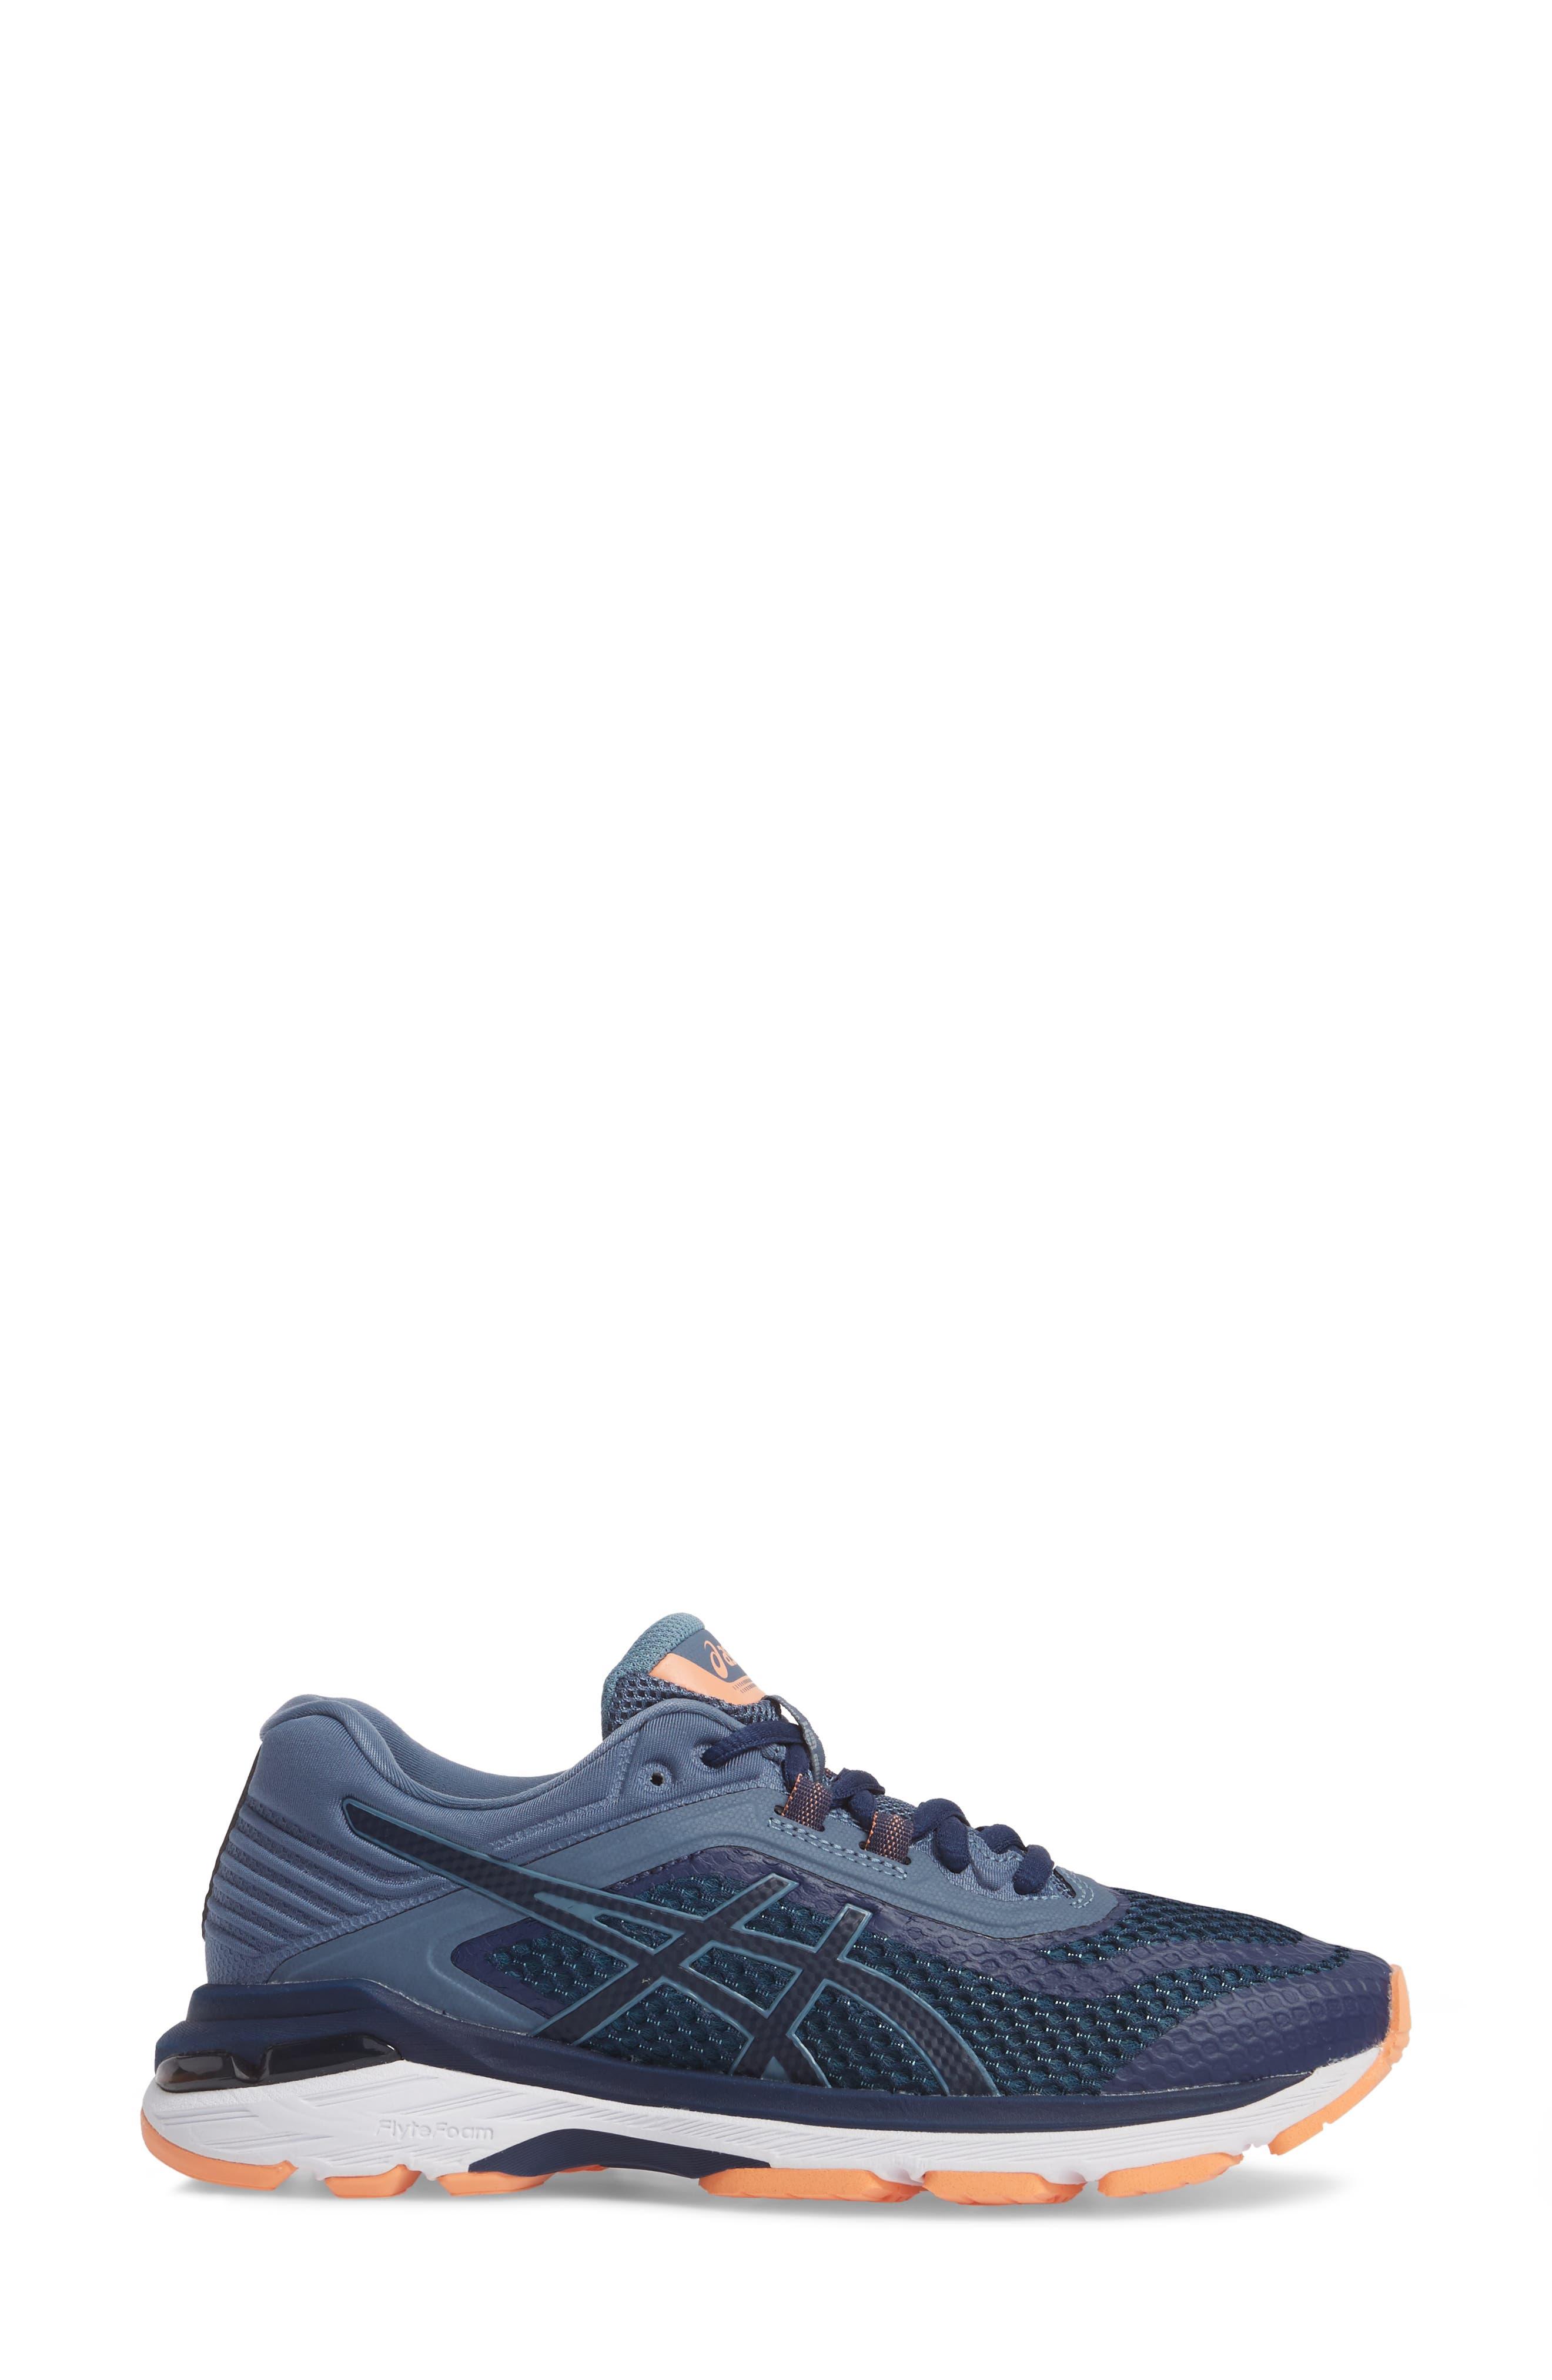 GT-2000 6 Running Shoe,                             Alternate thumbnail 3, color,                             Indigo Blue/ Smoke Blue